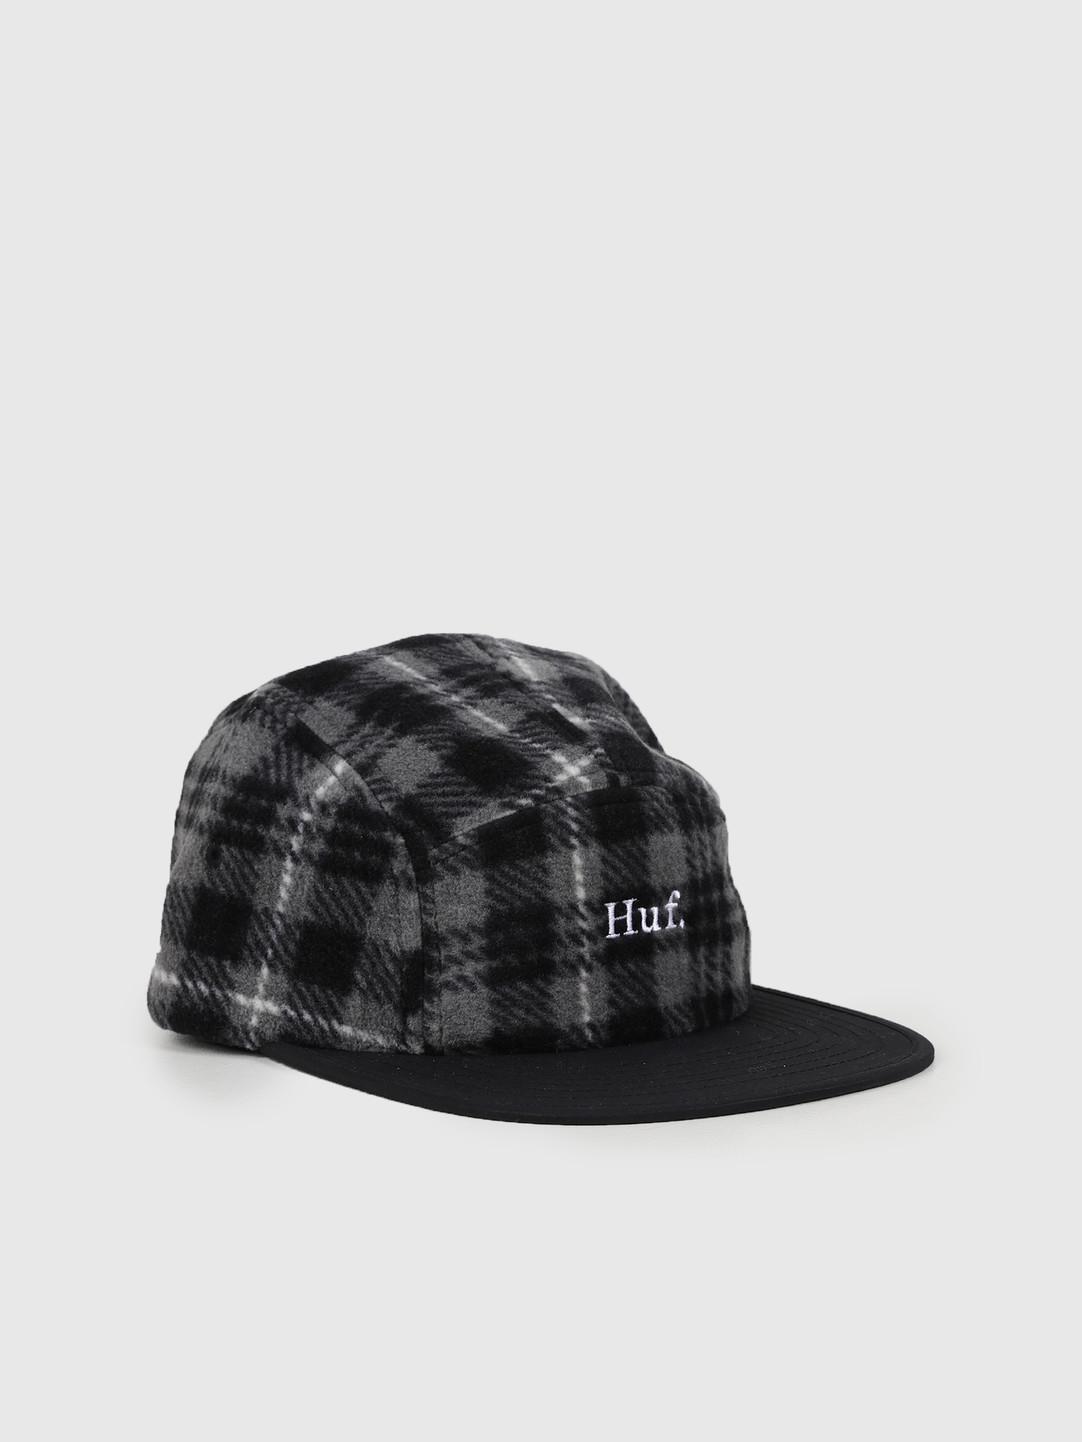 HUF HUF Boroughs Volley Hat Black Ht00409Black